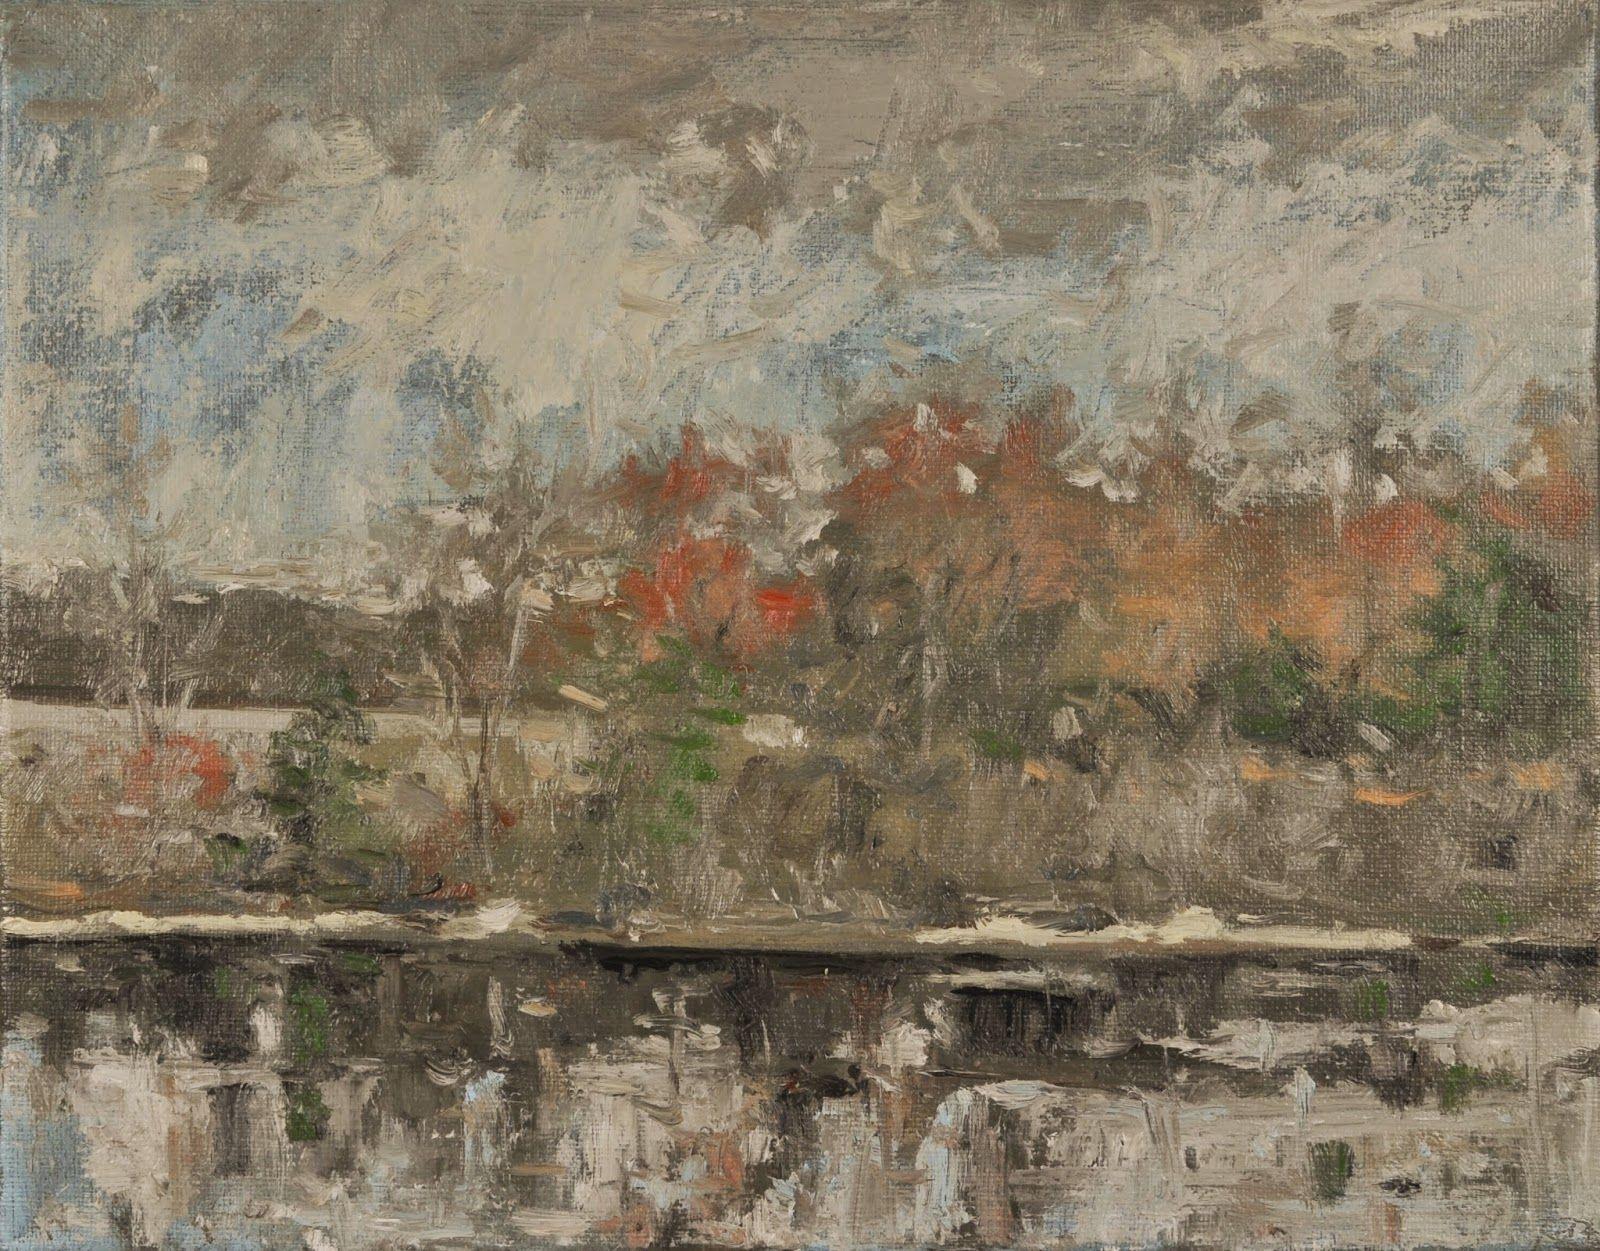 "Raymond Berry: Luck's, Light Rain, Spring Colors, March 25, 2015, Oil on Canvas, 11"" x 14"""